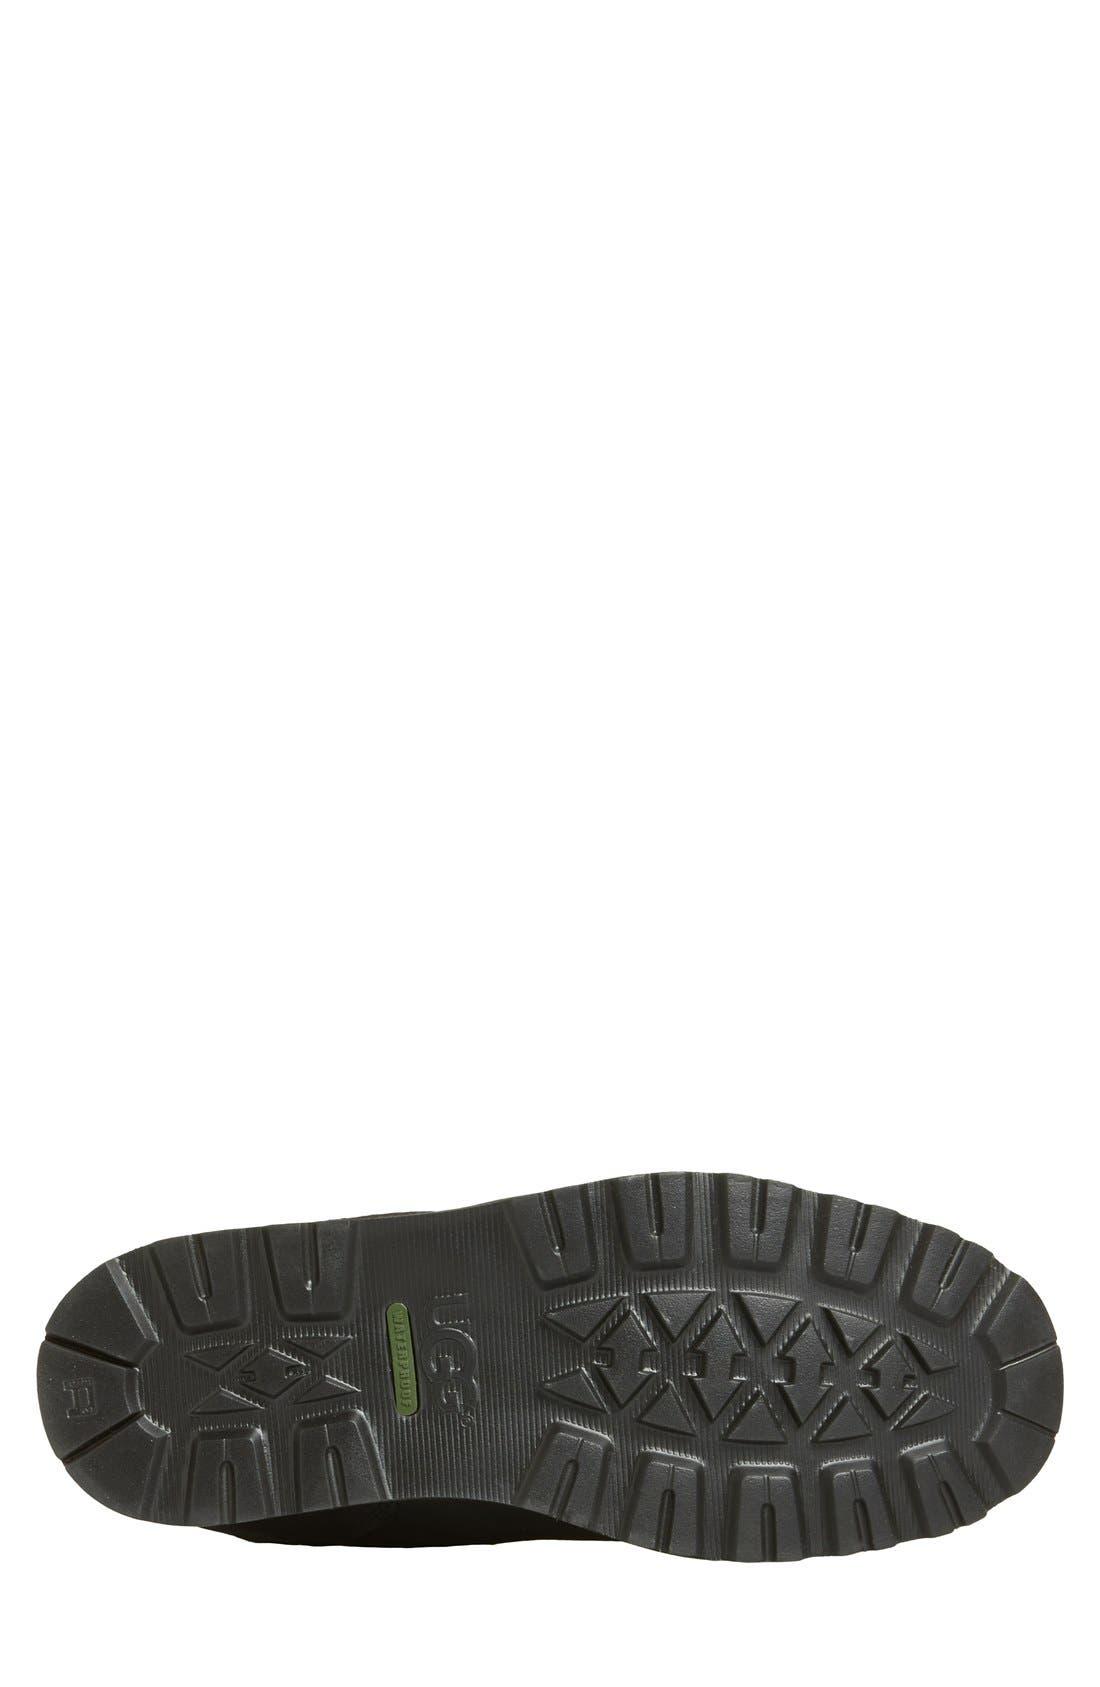 Hendren TL Waterproof Zip Boot,                             Alternate thumbnail 4, color,                             Black